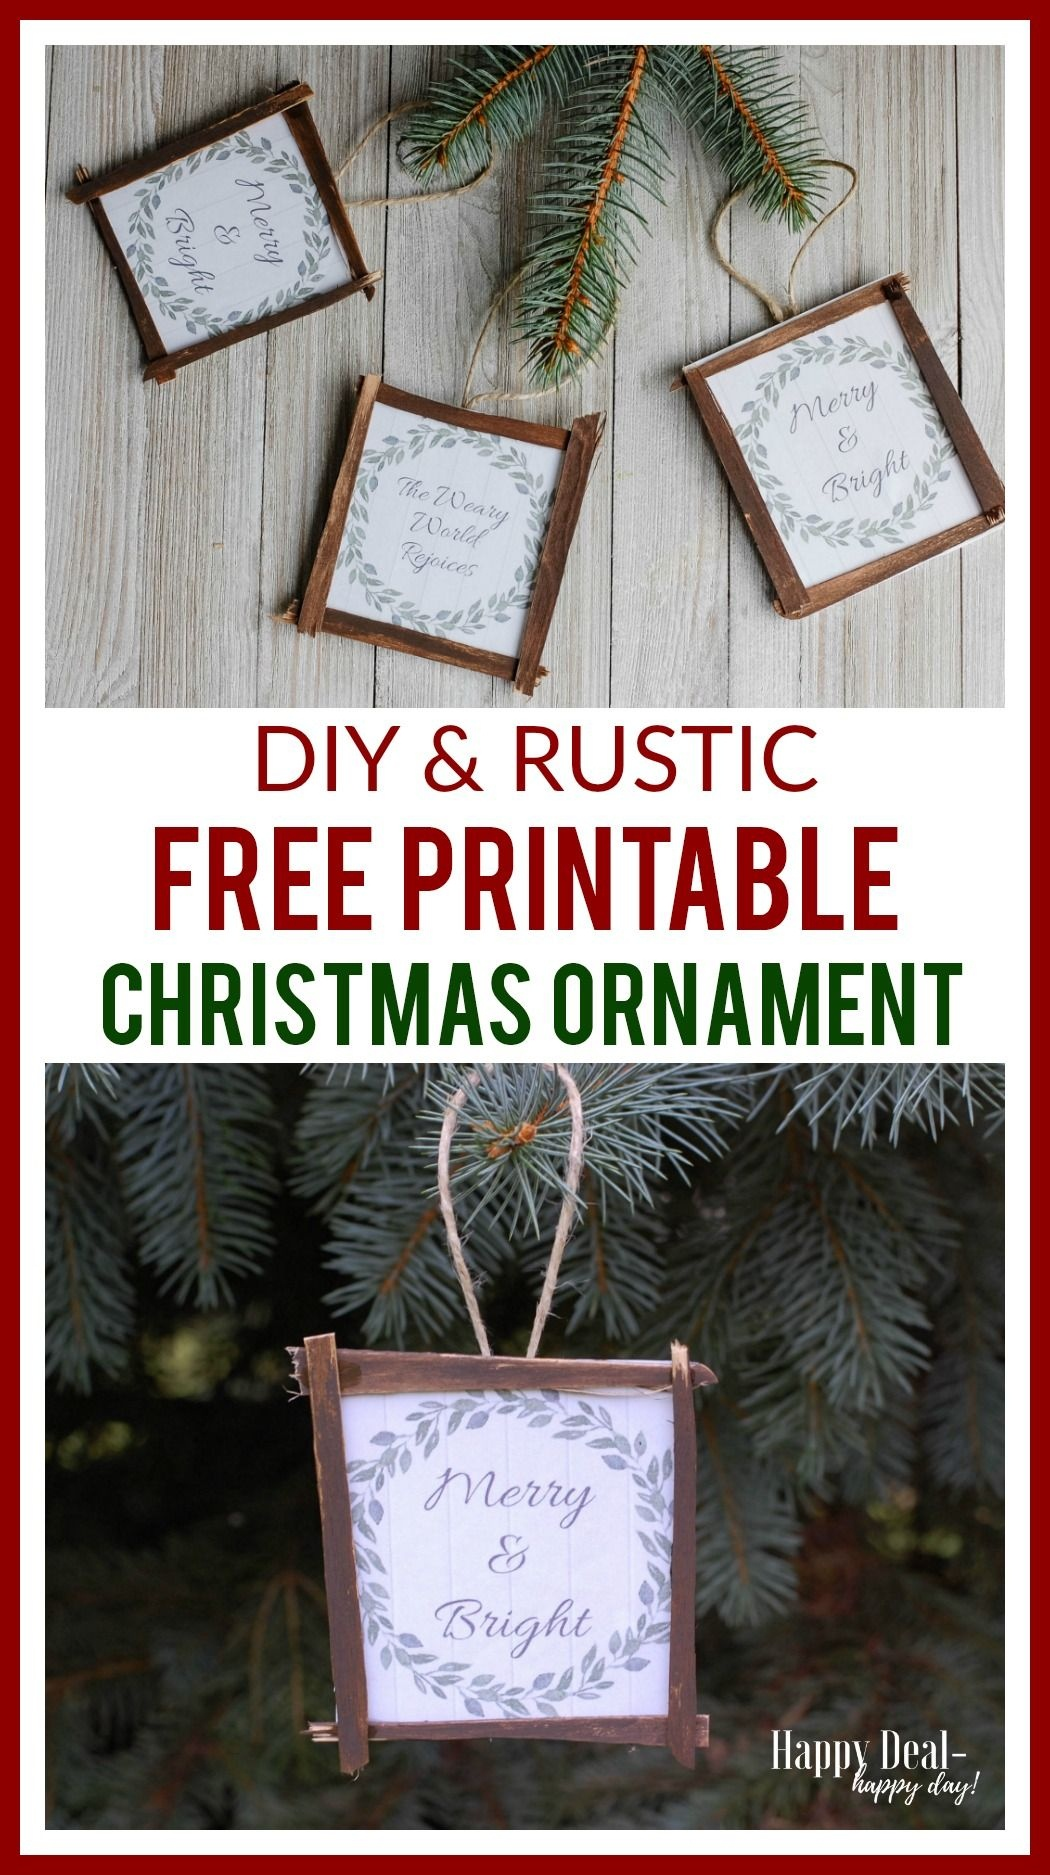 Free Printable Diy Rustic Christmas Ornaments! | Handmade Craft - Free Printable Christmas Decorations